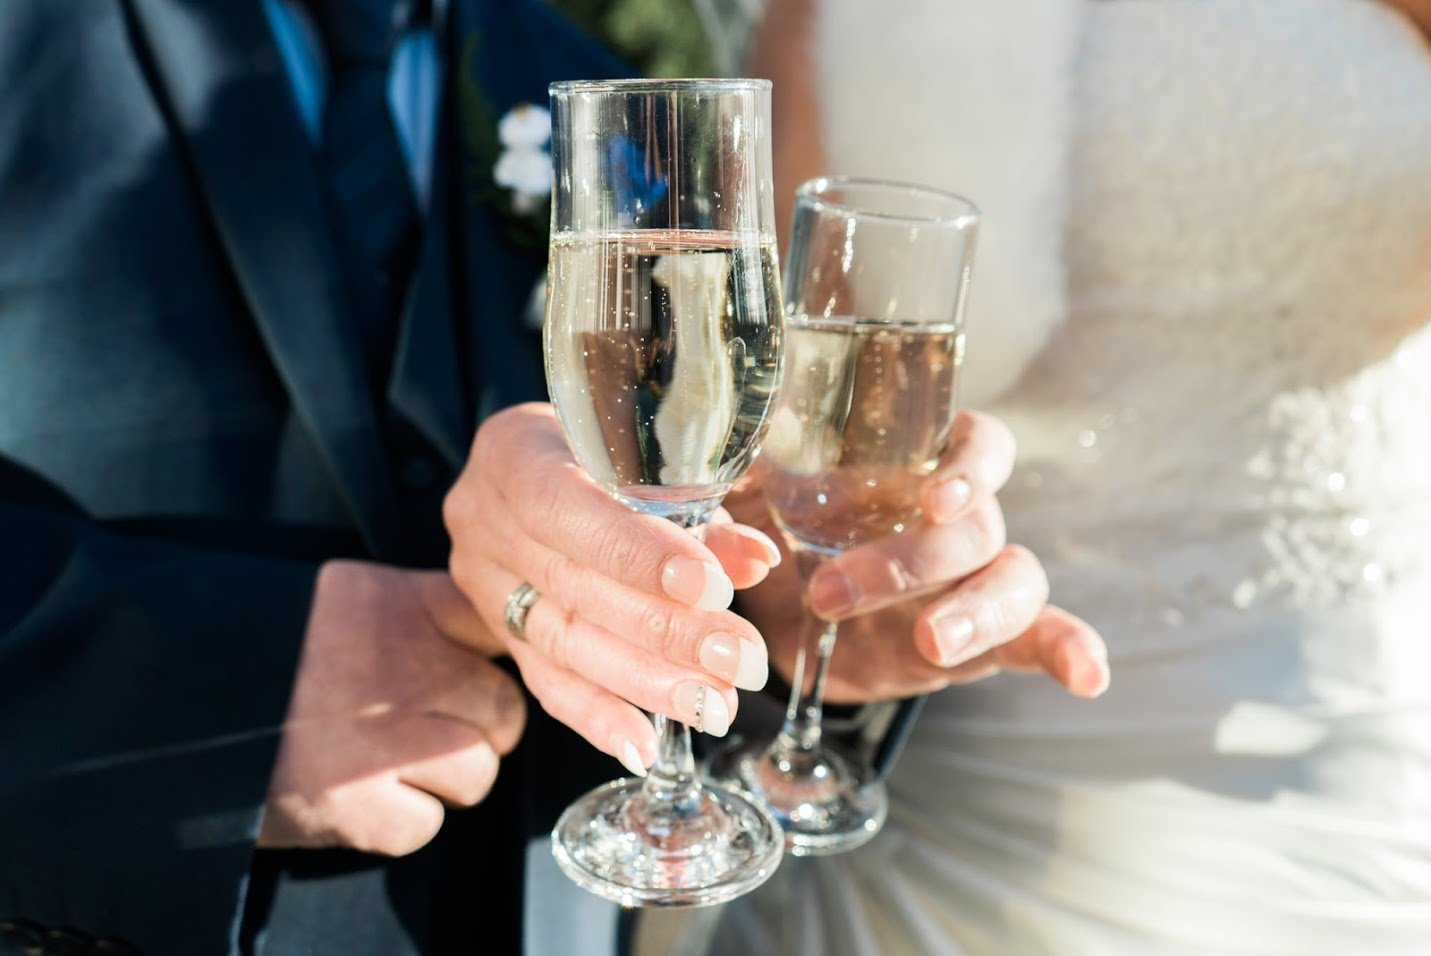 MarkHeather 164442 - Solihull Registry Office Wedding - Mark & Heather